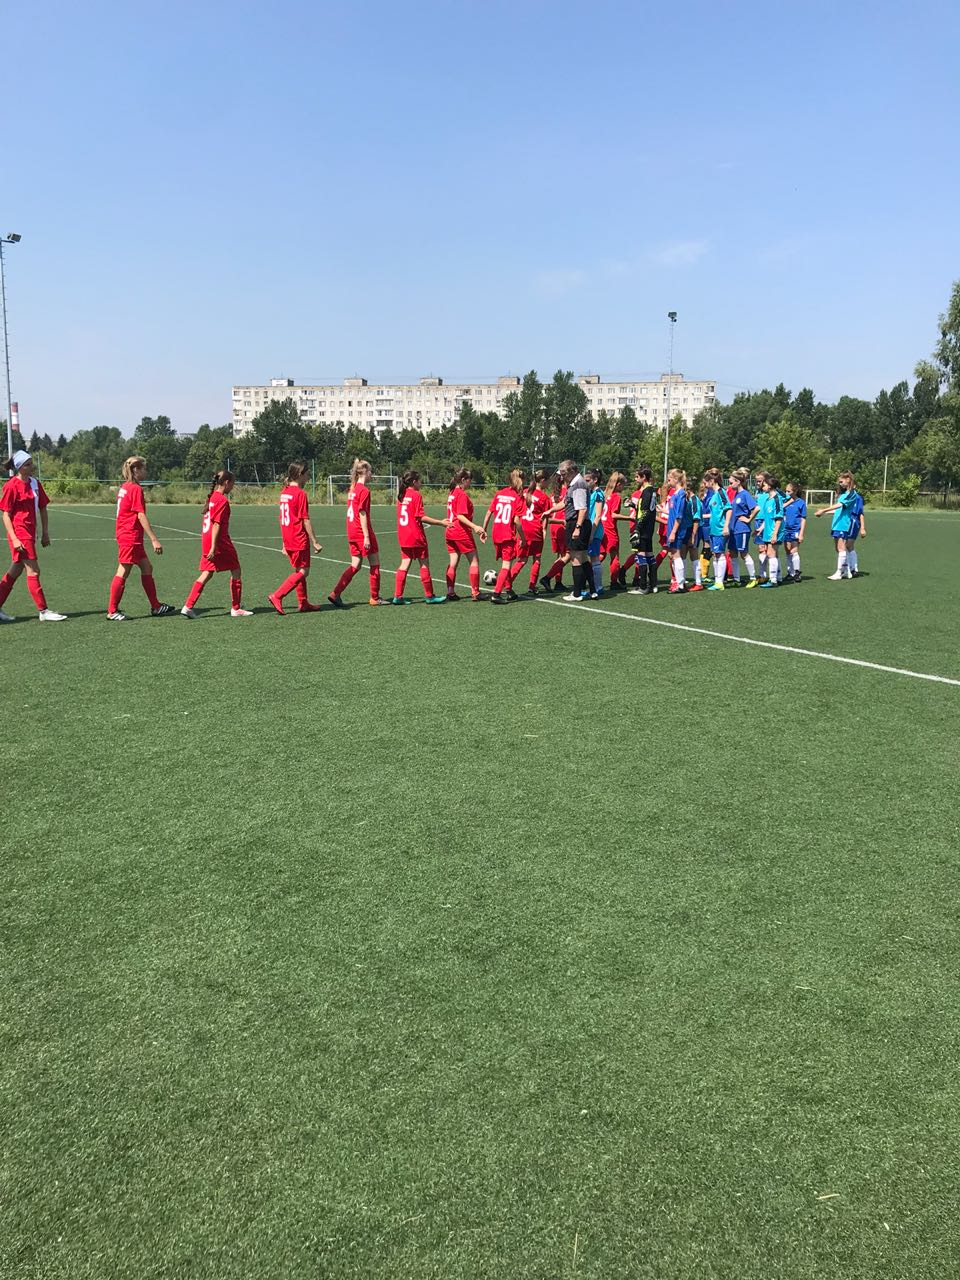 Команда ГБУ МО «СШОР по игровым видам спорта» оде ржала победу со счётом 10:1.